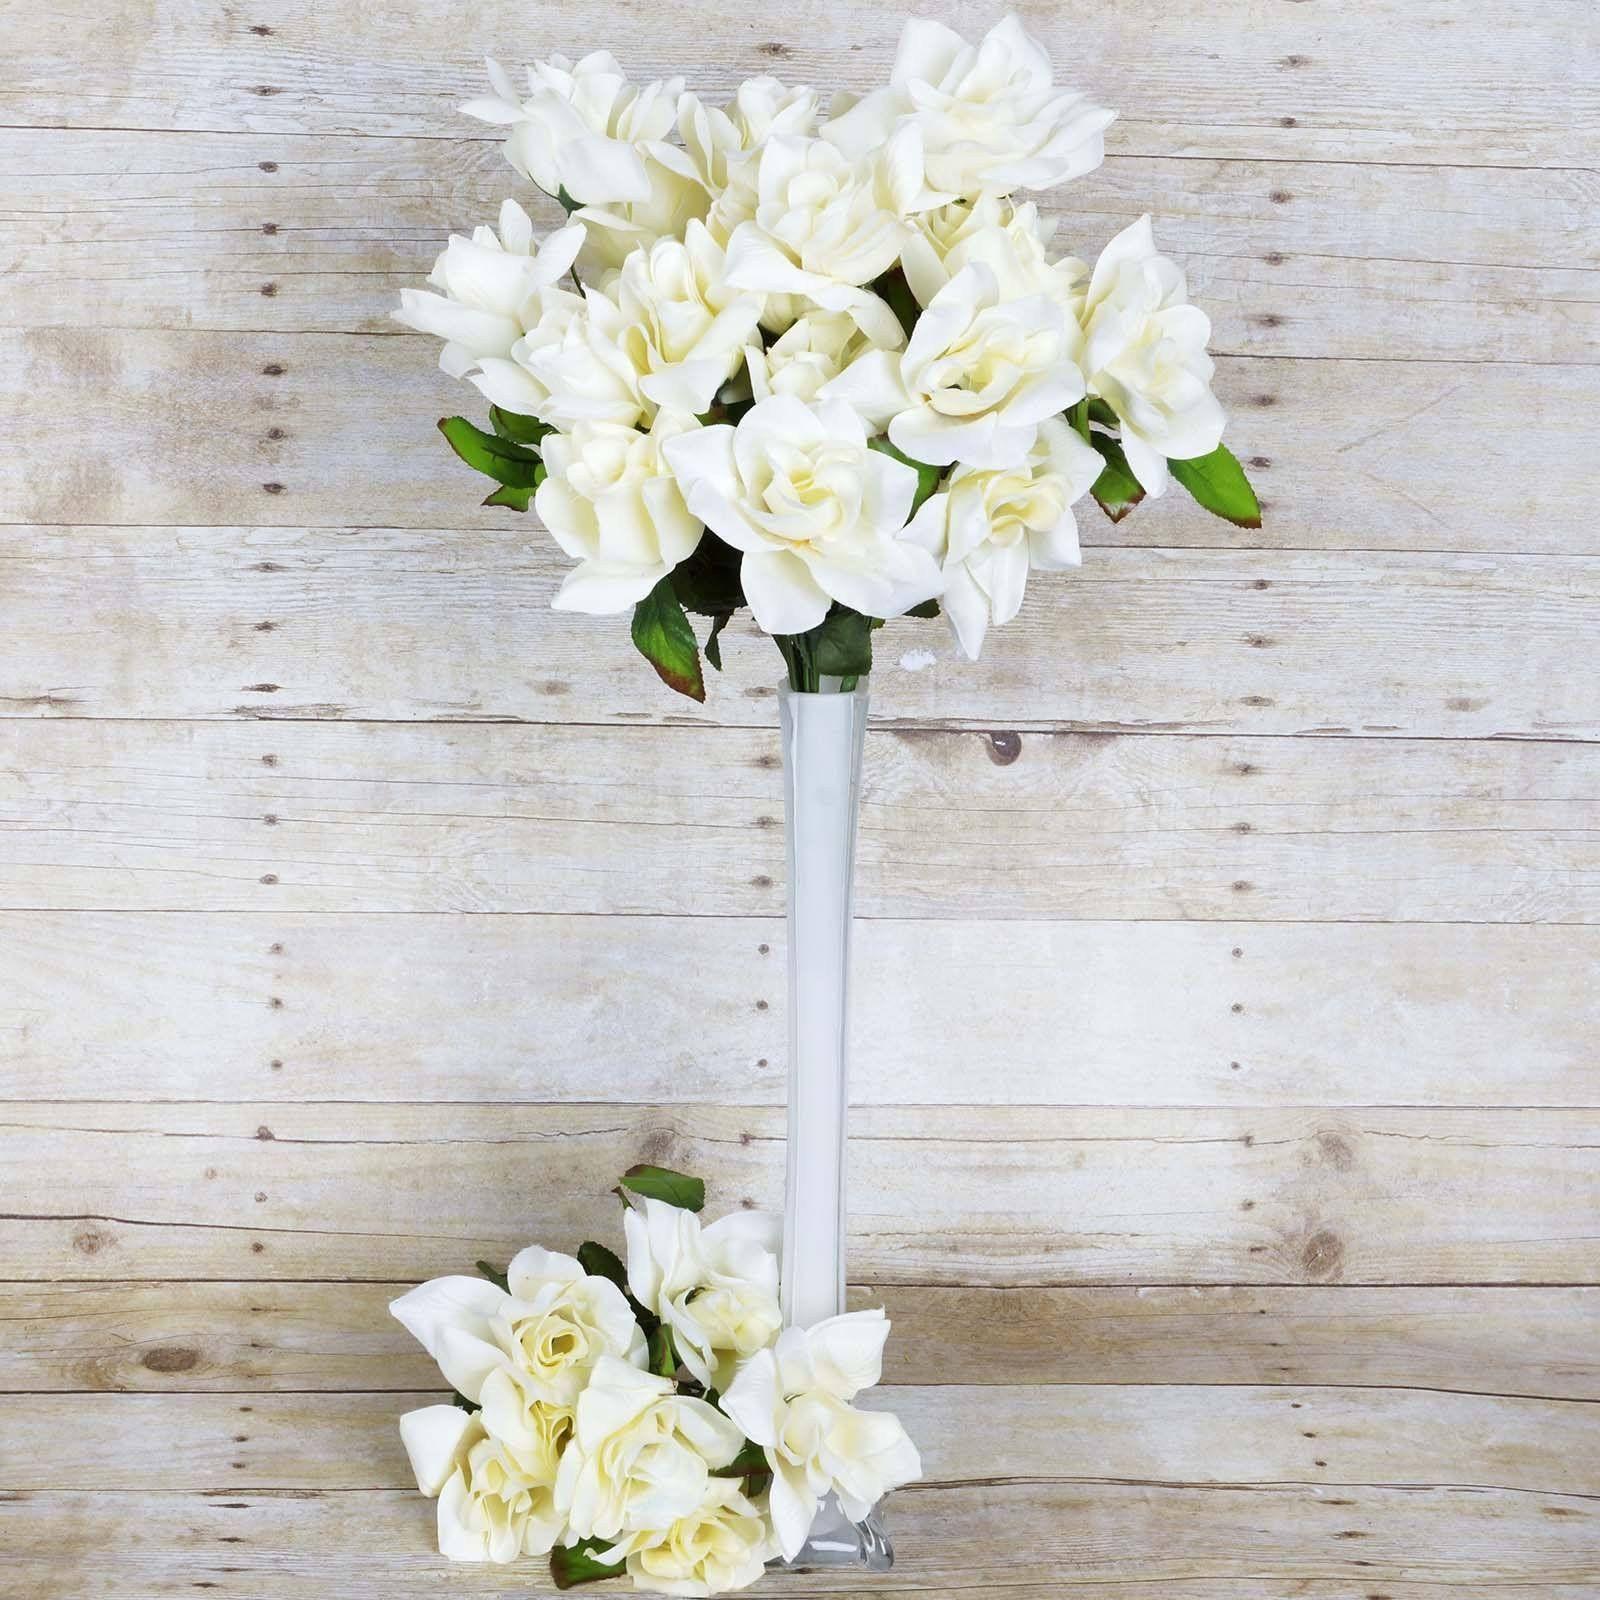 168 Artificial Cream Velvet Bloom Rose Flowers Wedding Bridal